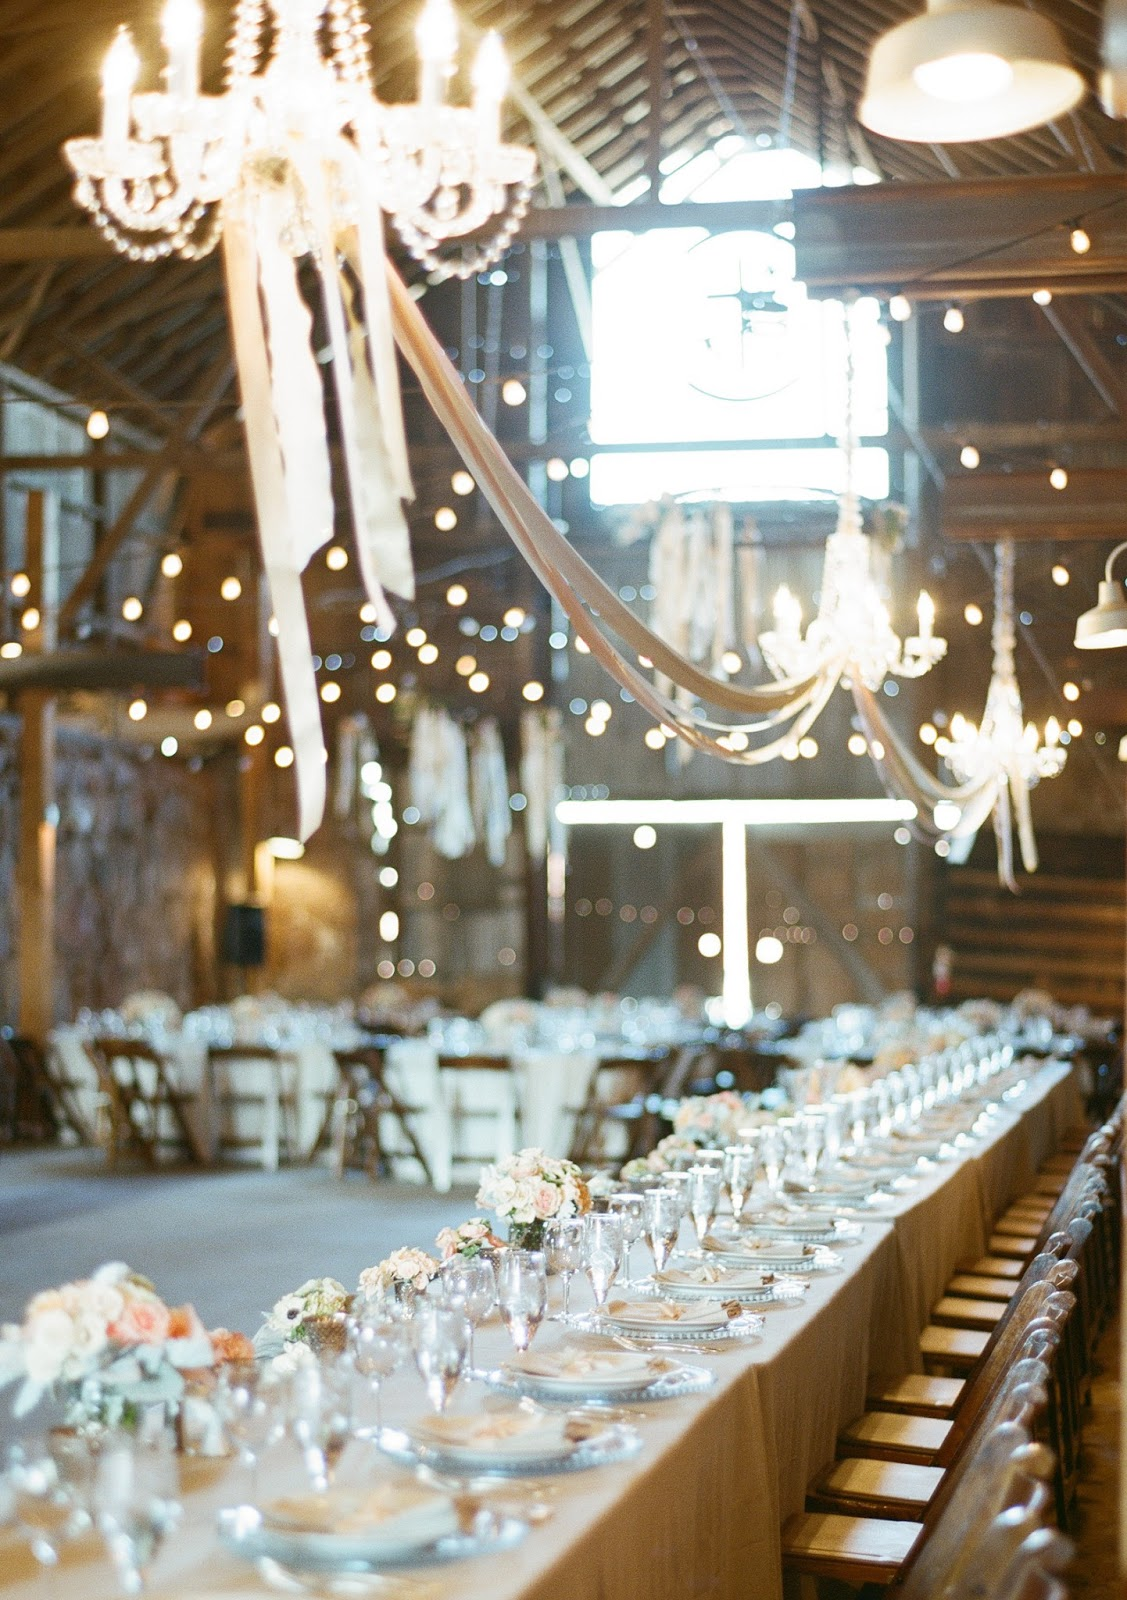 sylvie-gil-film-photography-wedding-santa-margarita-ranch-long-wooden-table-chandelier-flowers